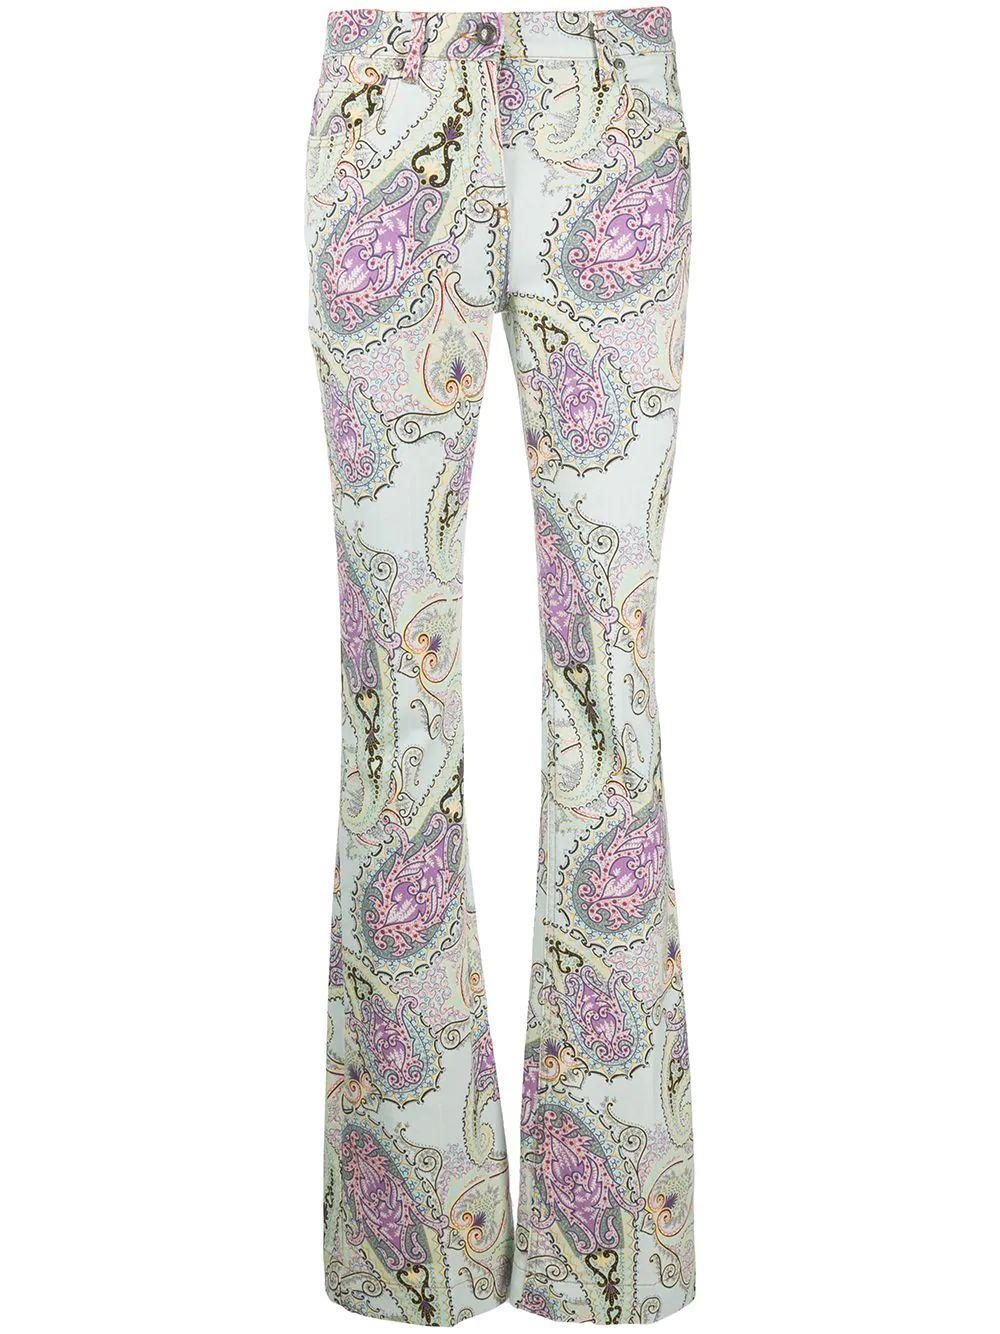 Paisley Jeans Item # 13693-9612